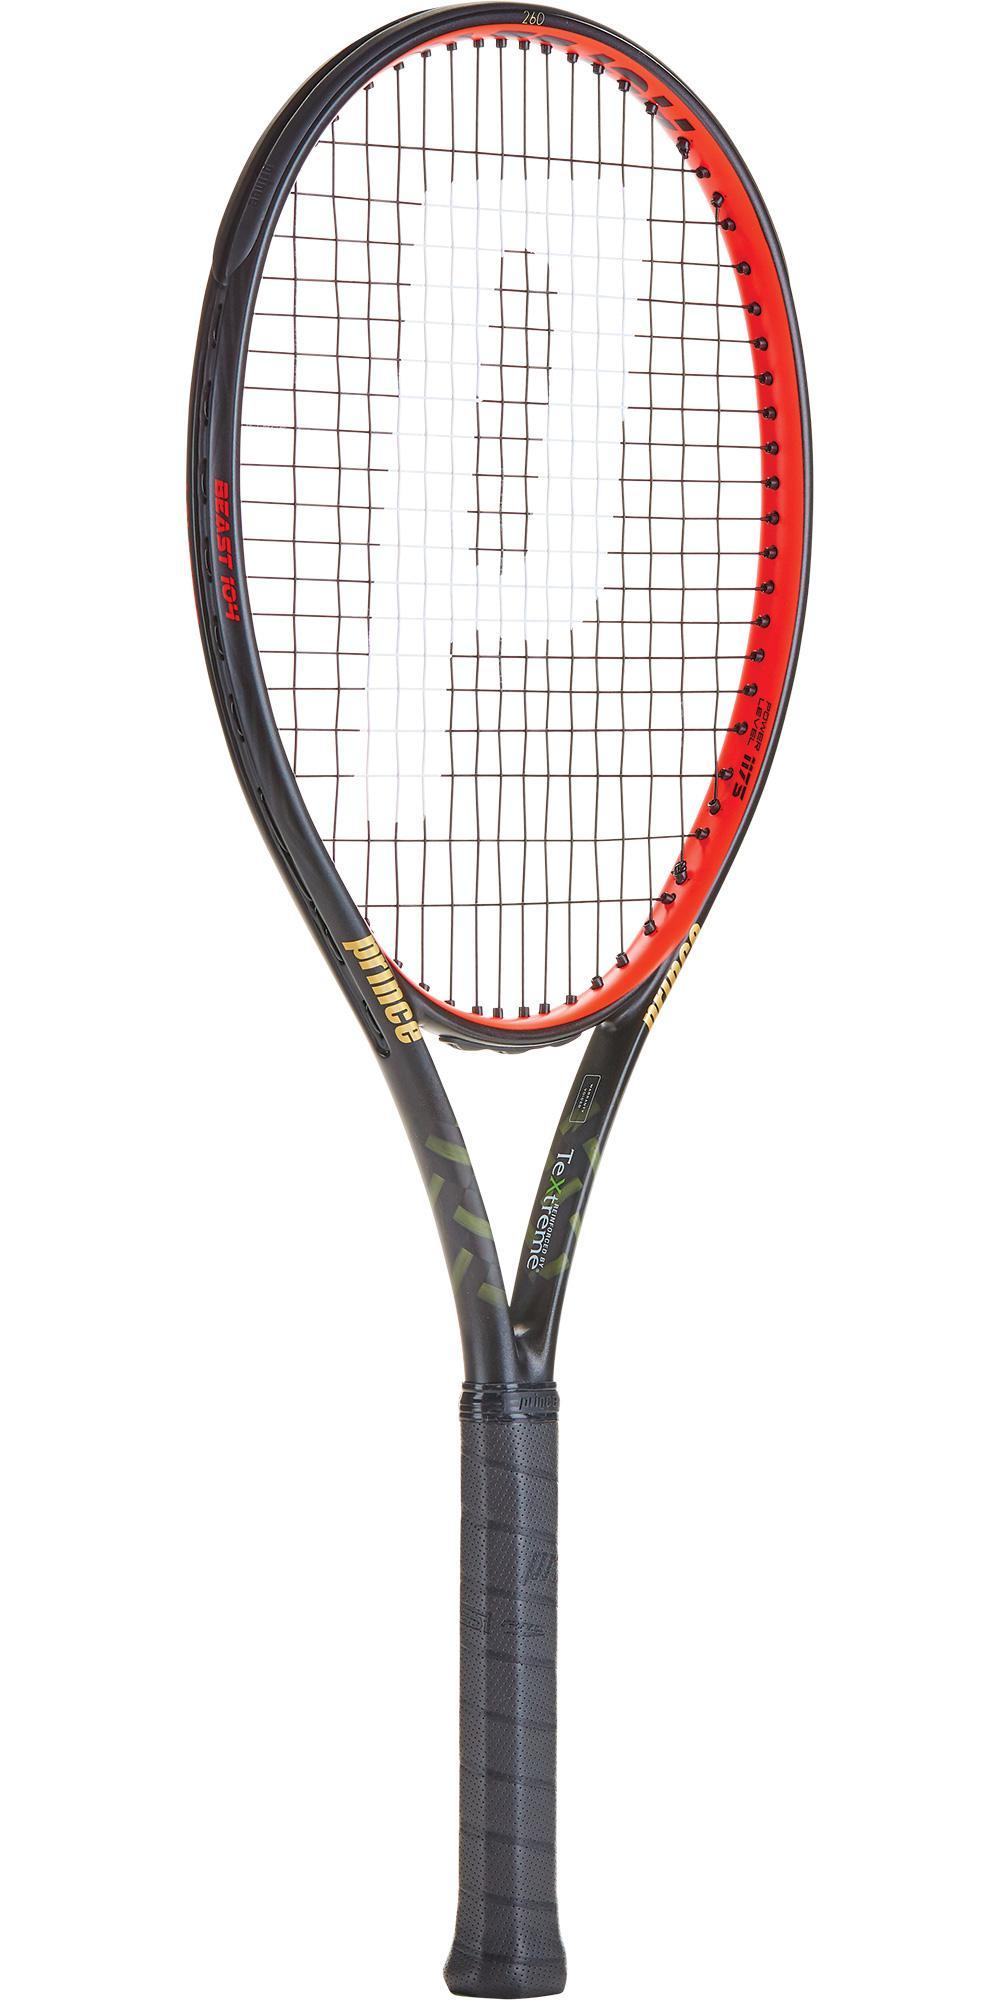 Prince TeXtreme Beast 104 (260g) Tennis Racket - Red - Tennisnuts.com